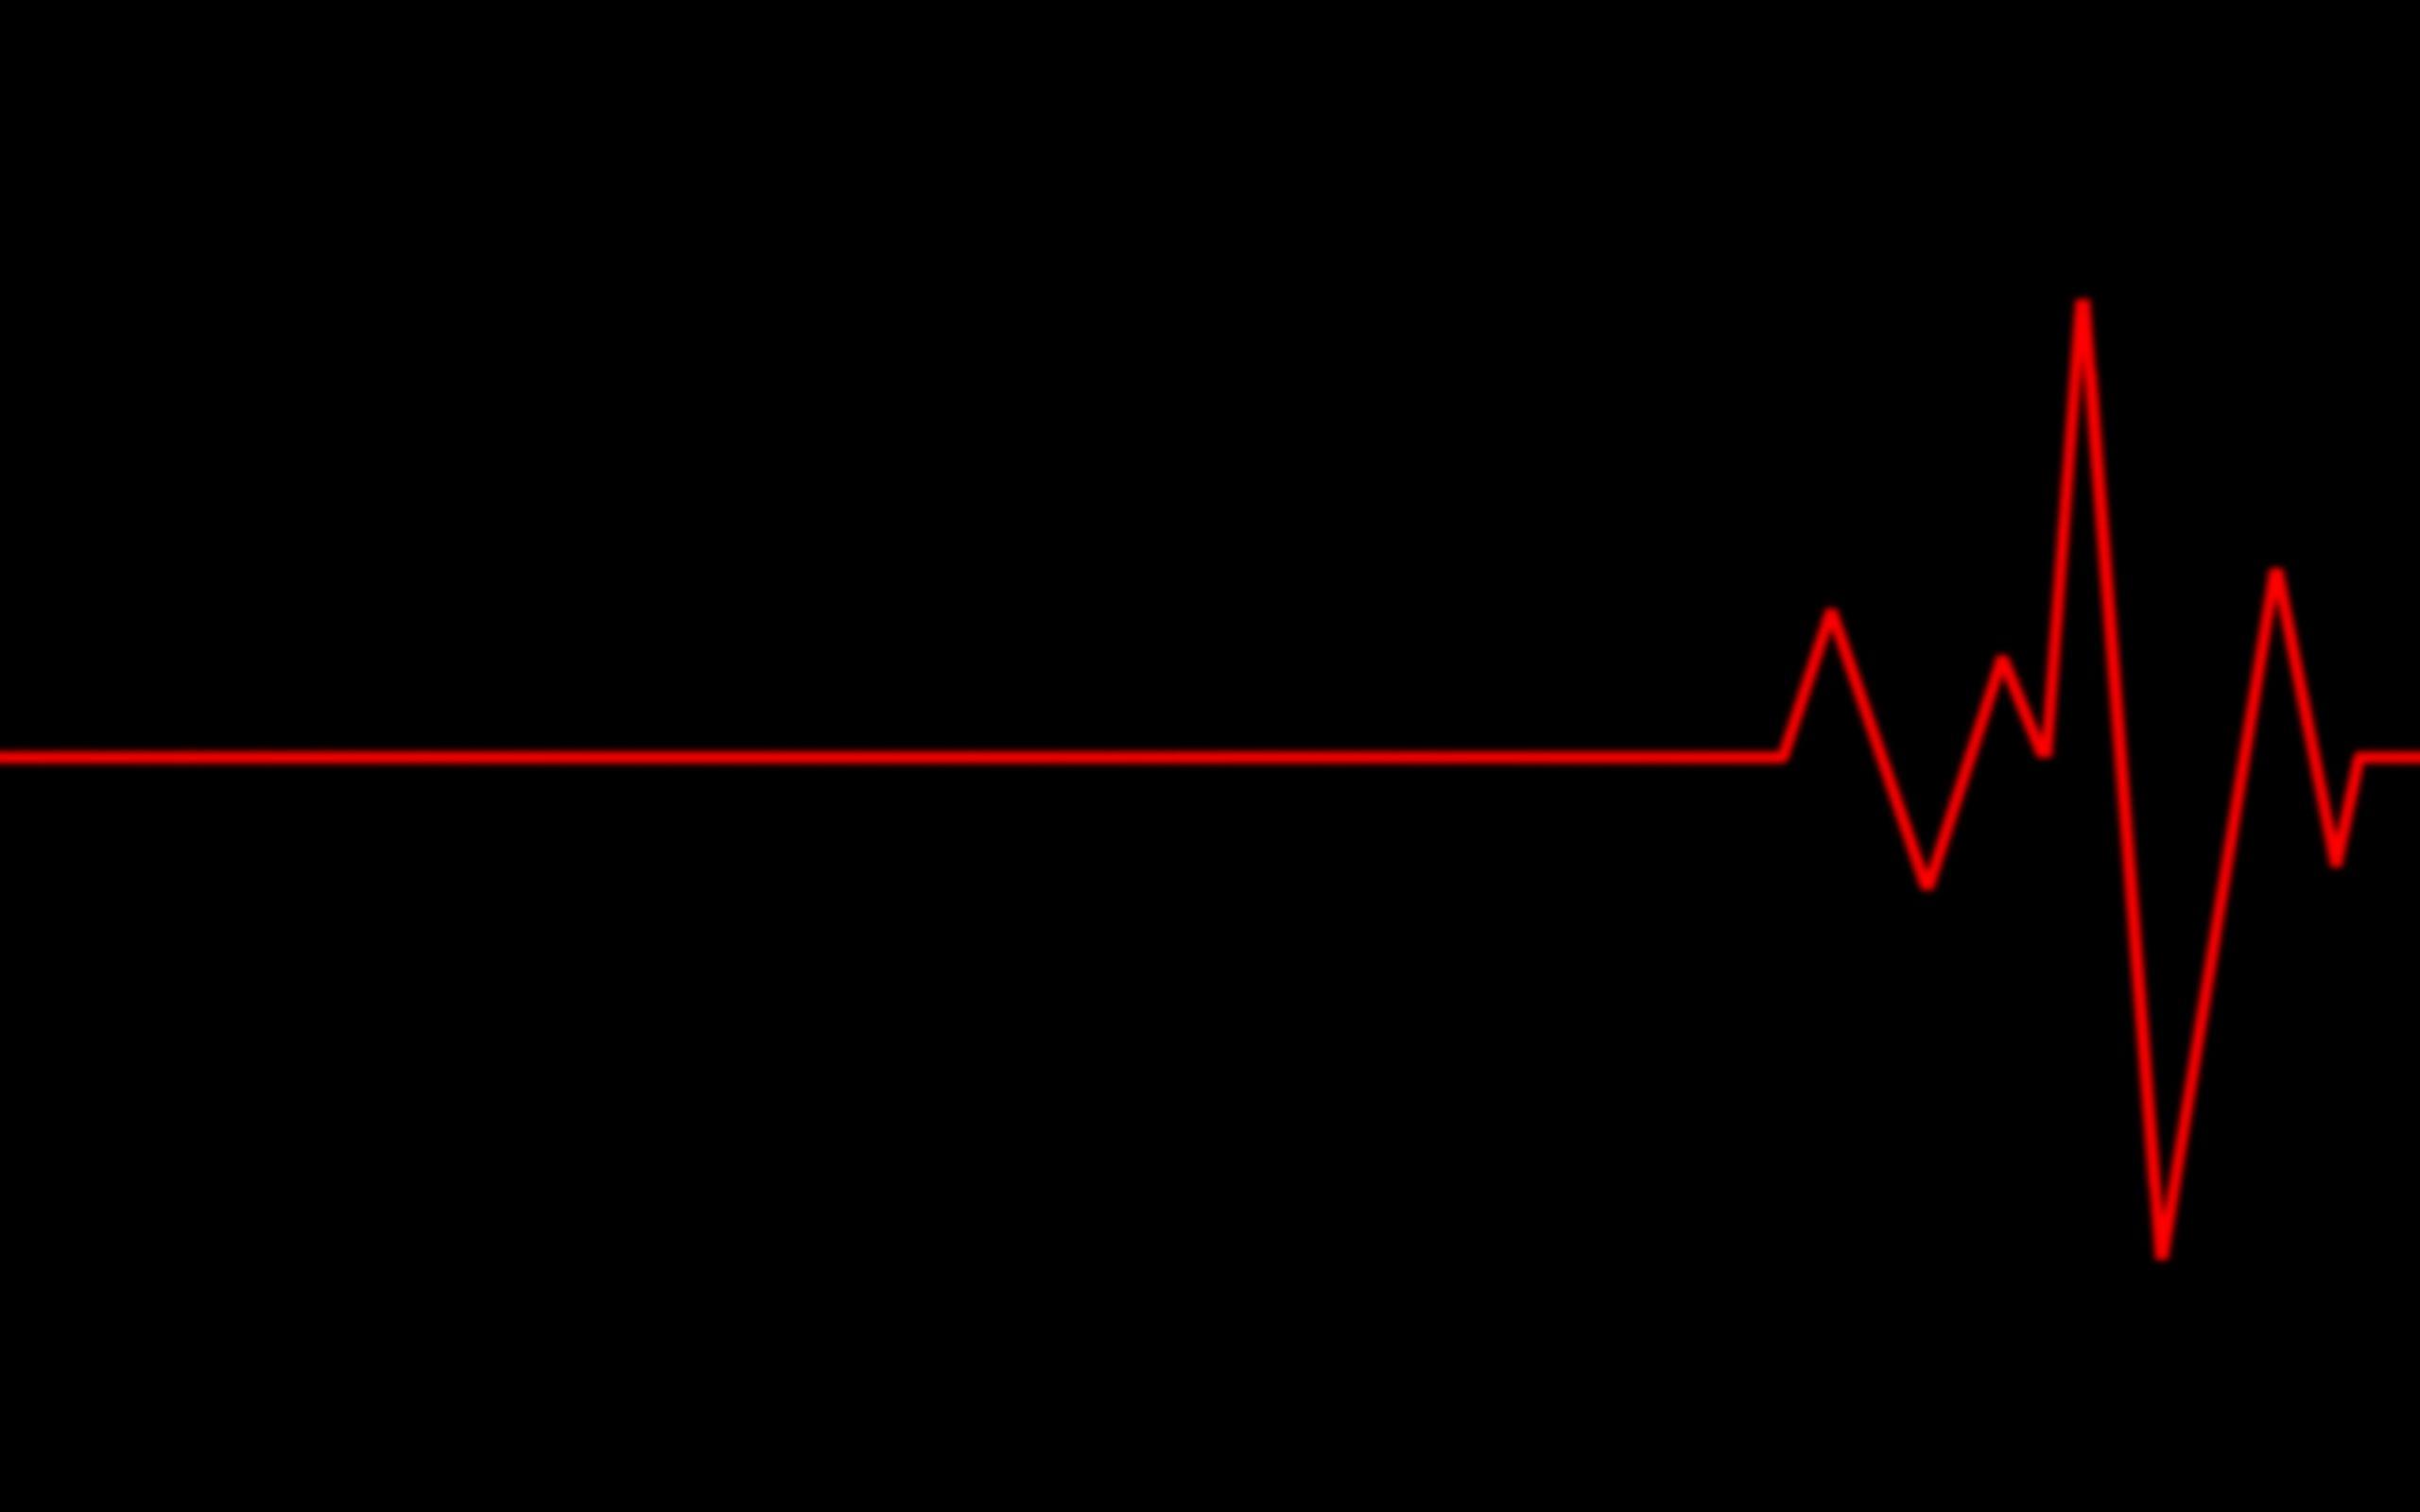 Pin By Zaira On And Black Heart Wallpaper In A Heartbeat Heart Wallpaper Hd